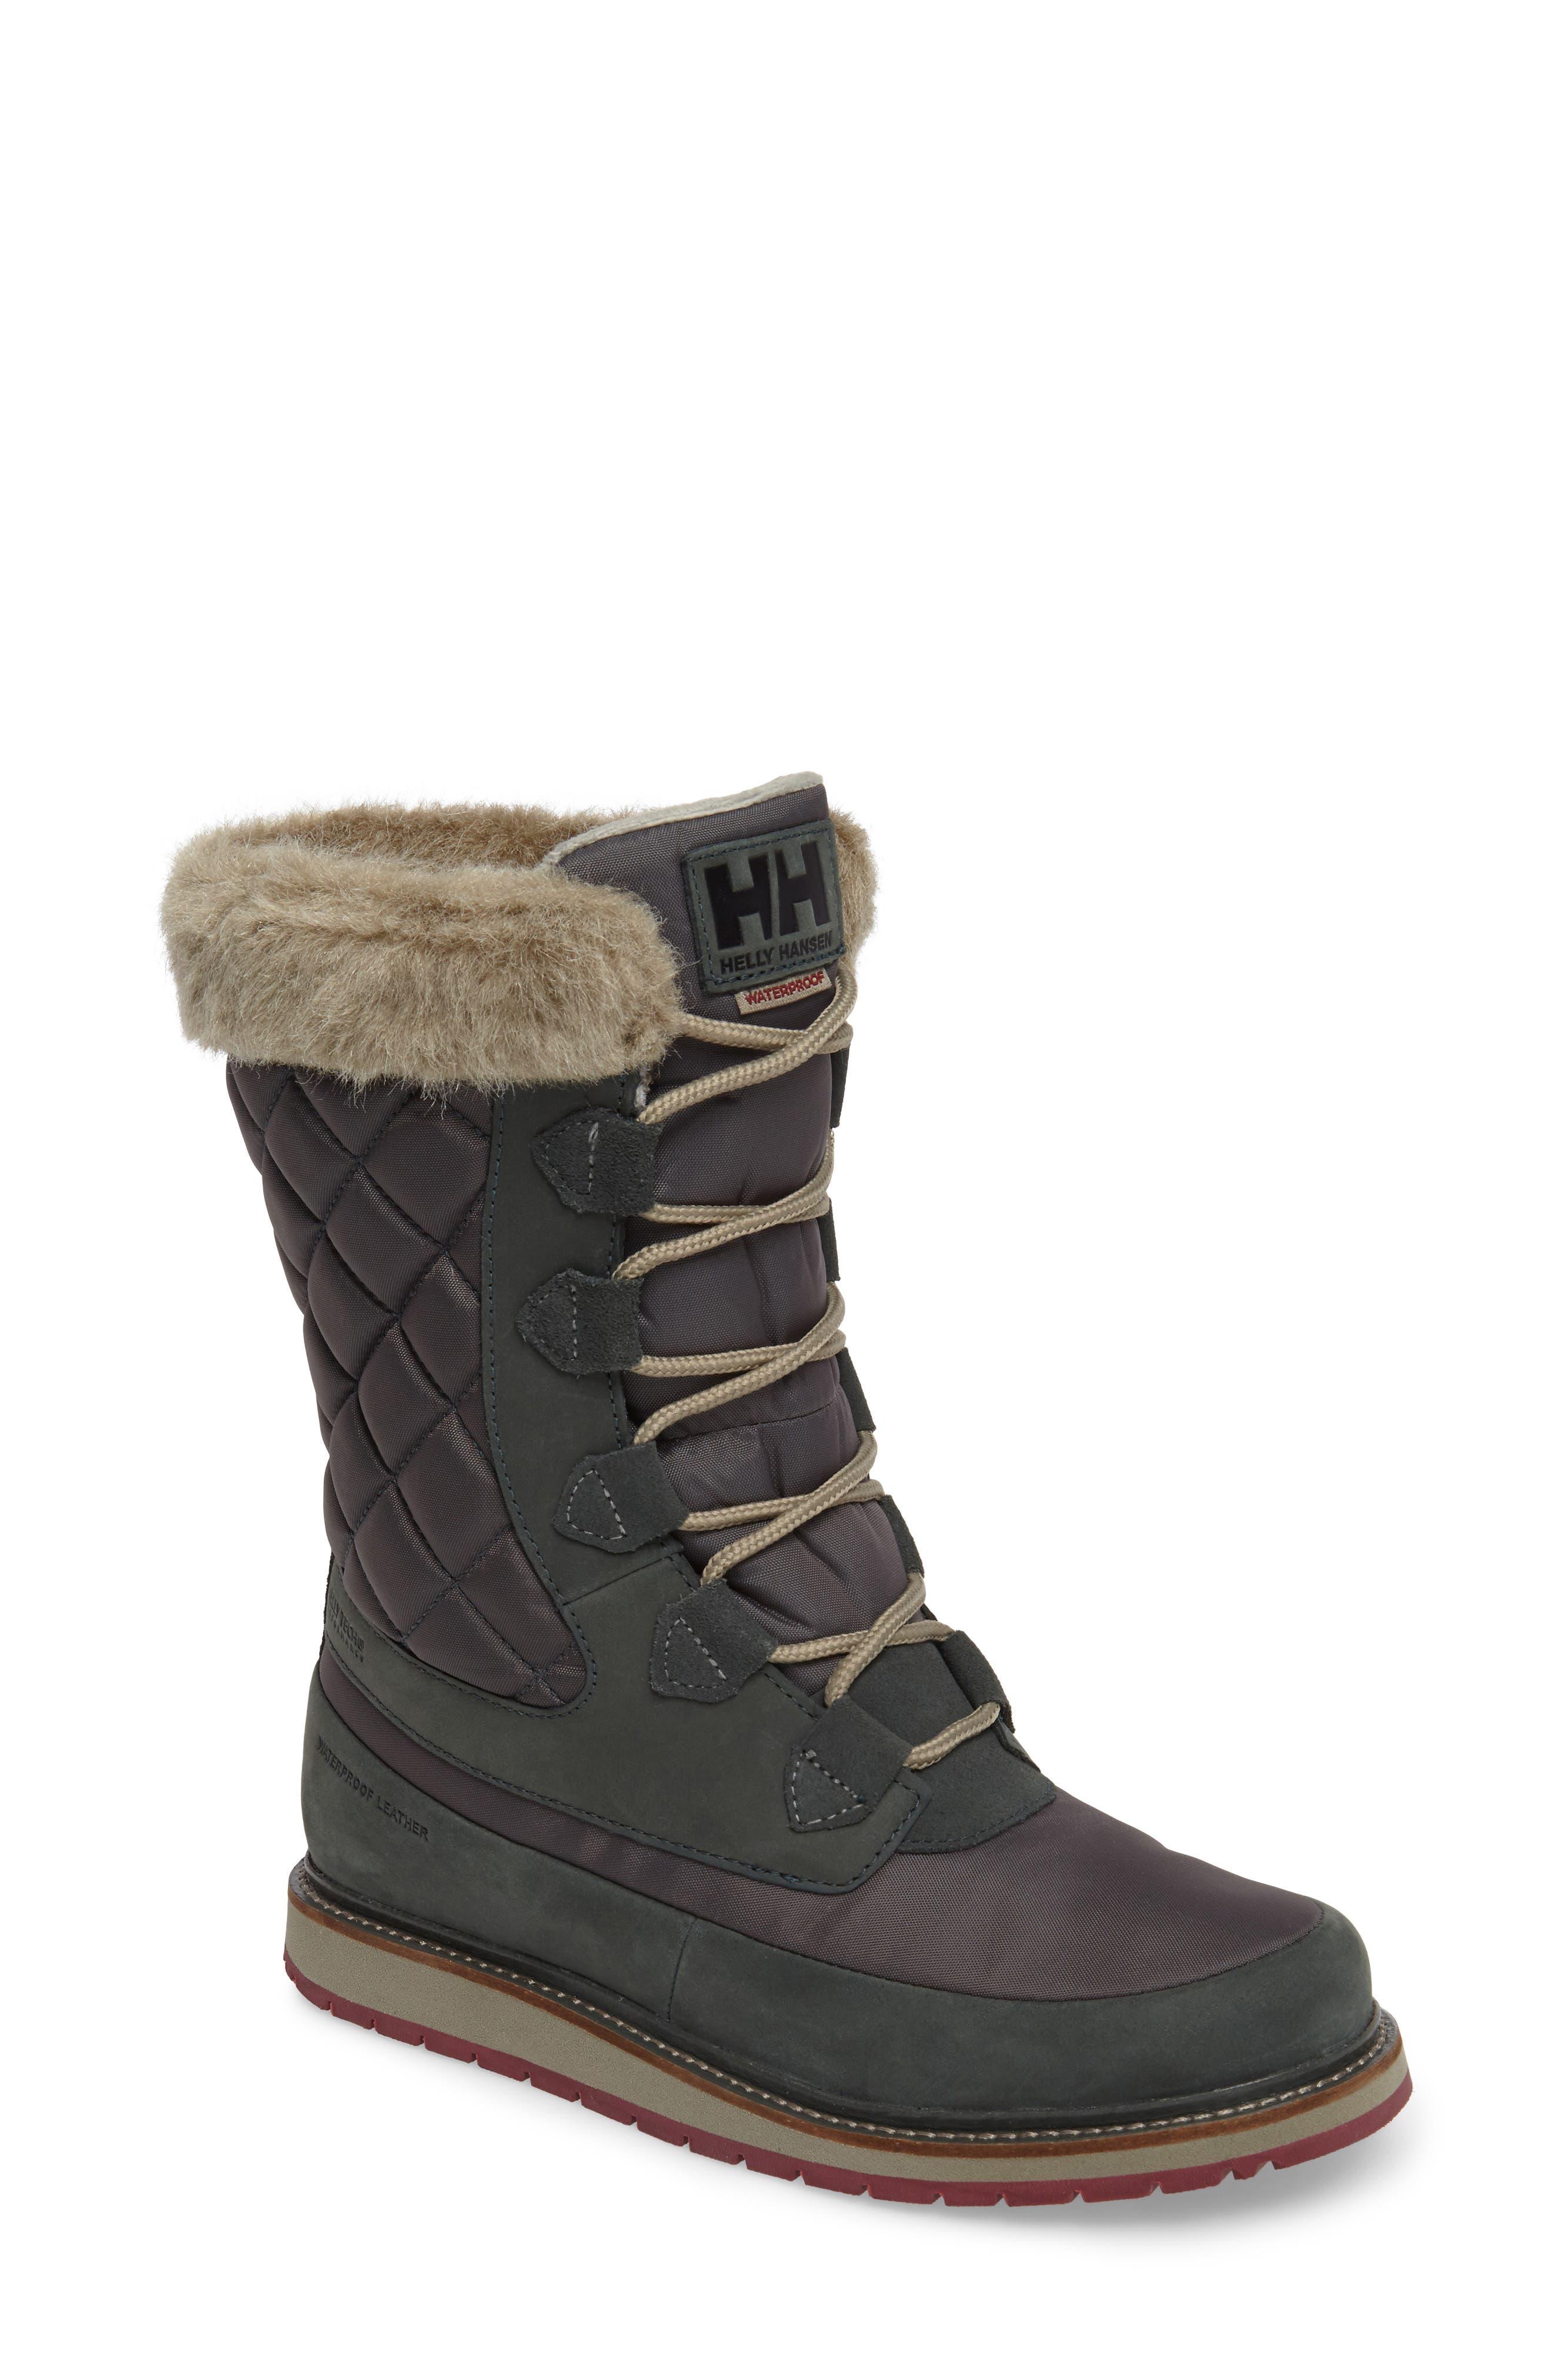 Arosa Waterproof Boot with Faux Fur Trim,                             Main thumbnail 1, color,                             Darkest Spruce / Rock / La